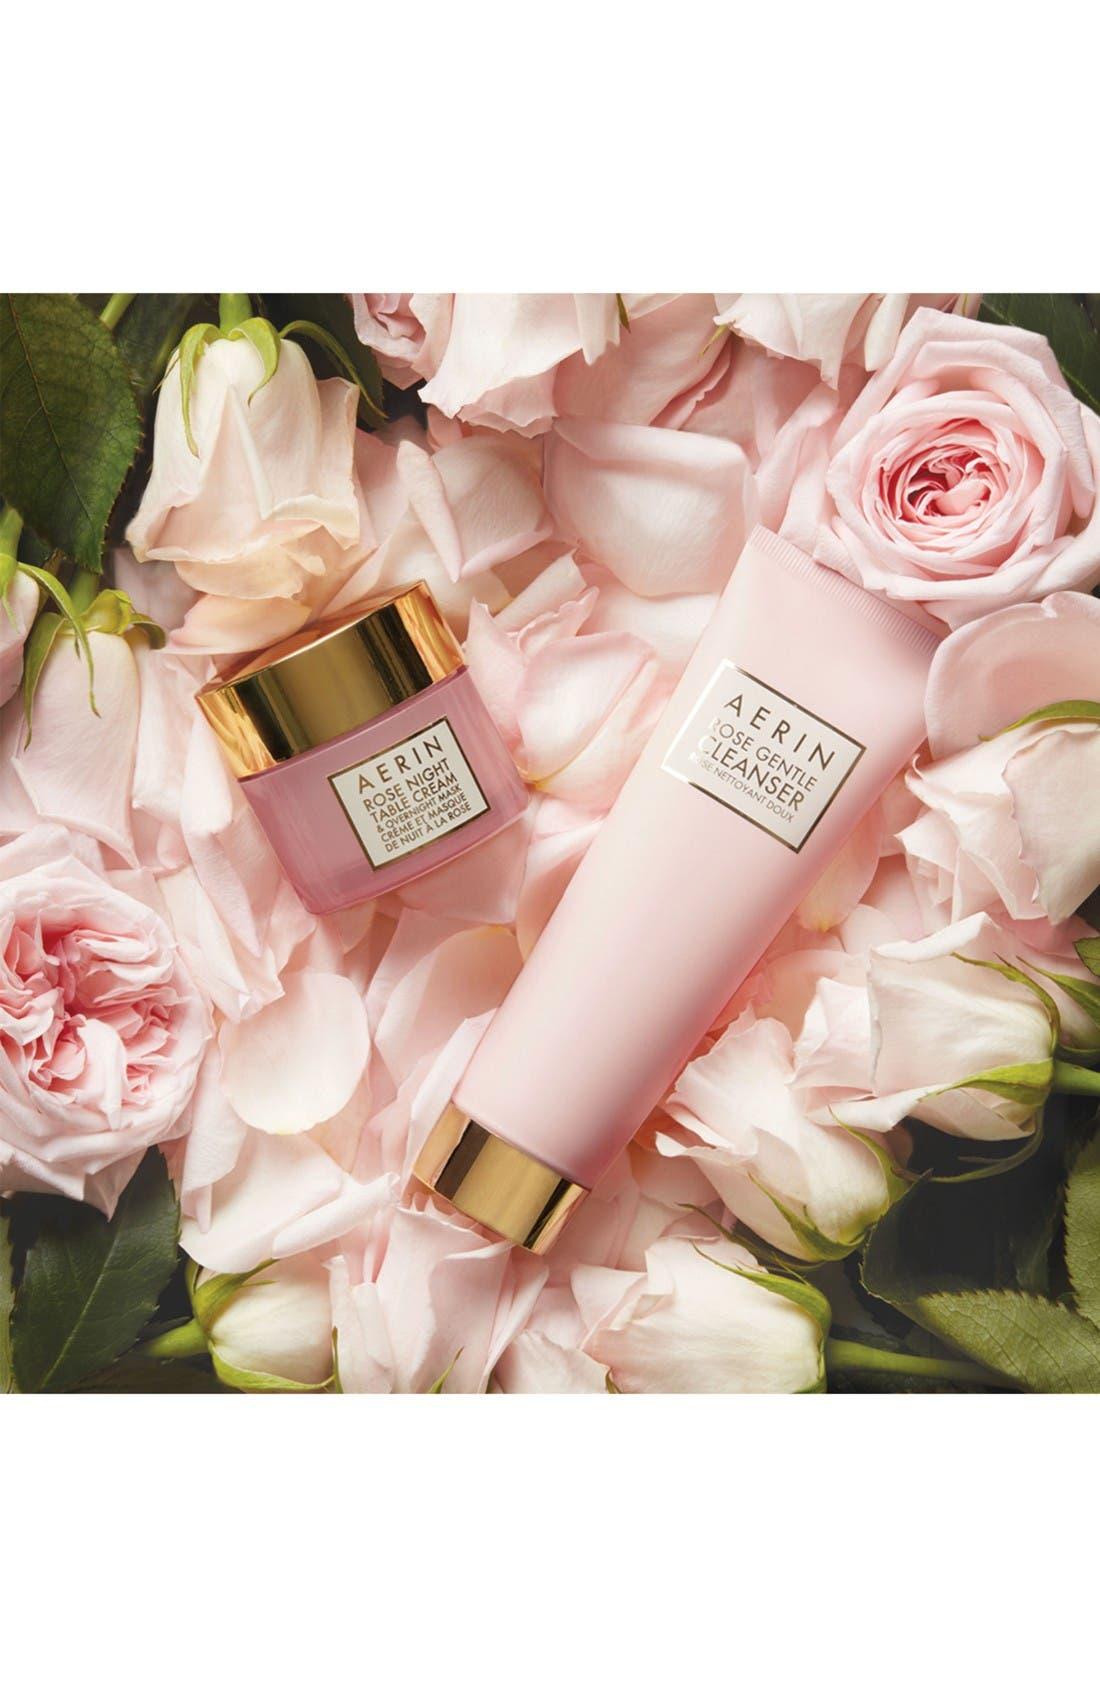 Alternate Image 3  - AERIN Beauty Rose Night Table Cream & Overnight Mask